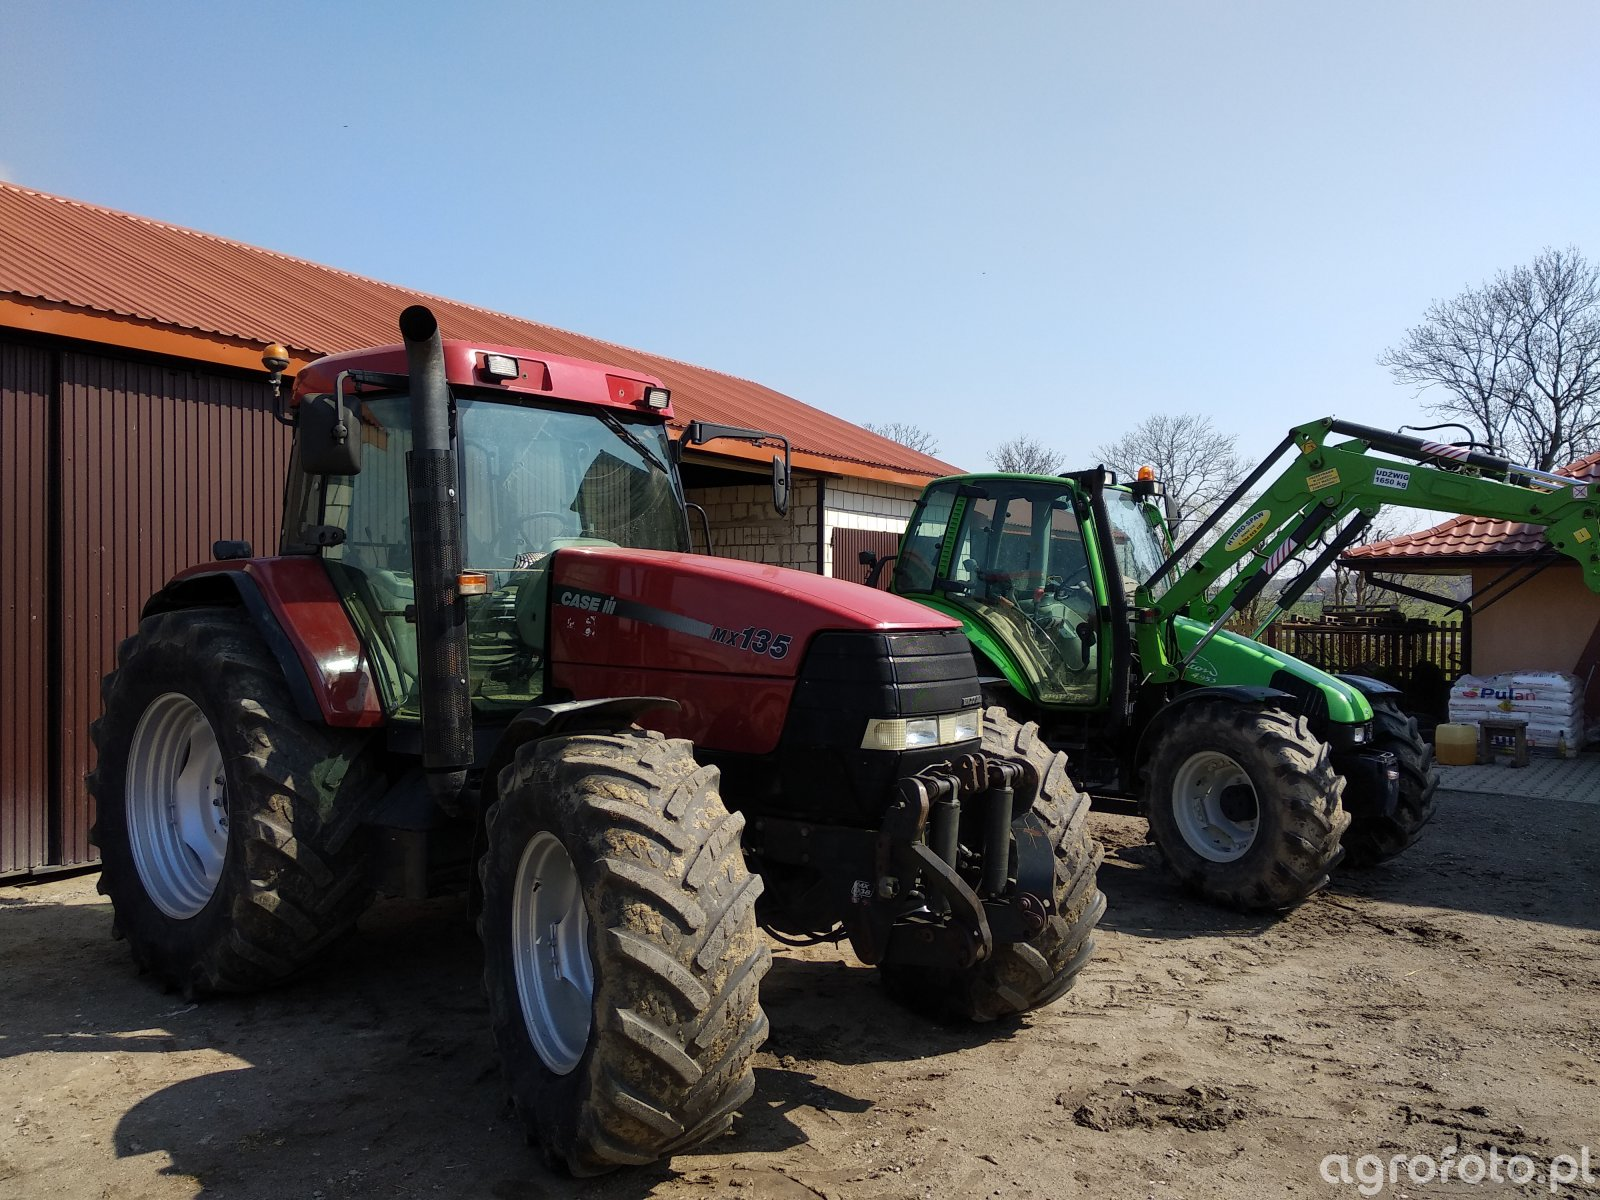 Case Mx 135 + Deutz-Fahr Agrotron 4.95